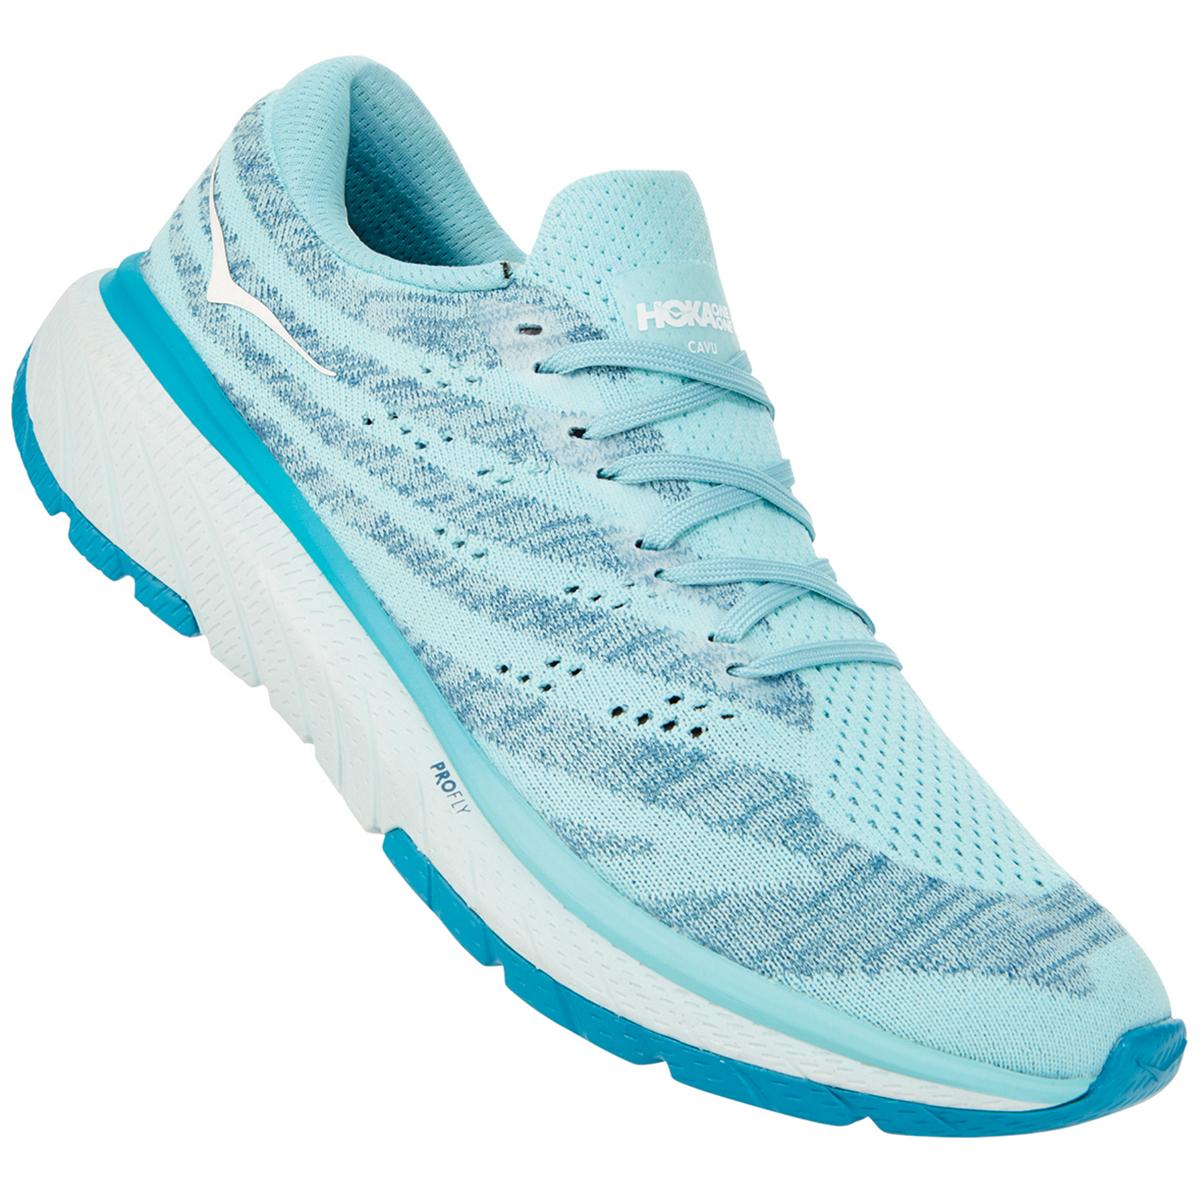 Women's Hoka One One Cavu 3 Running Shoe - Color: Stellar  - Size: 5 - Width: Regular, Stellar, large, image 5